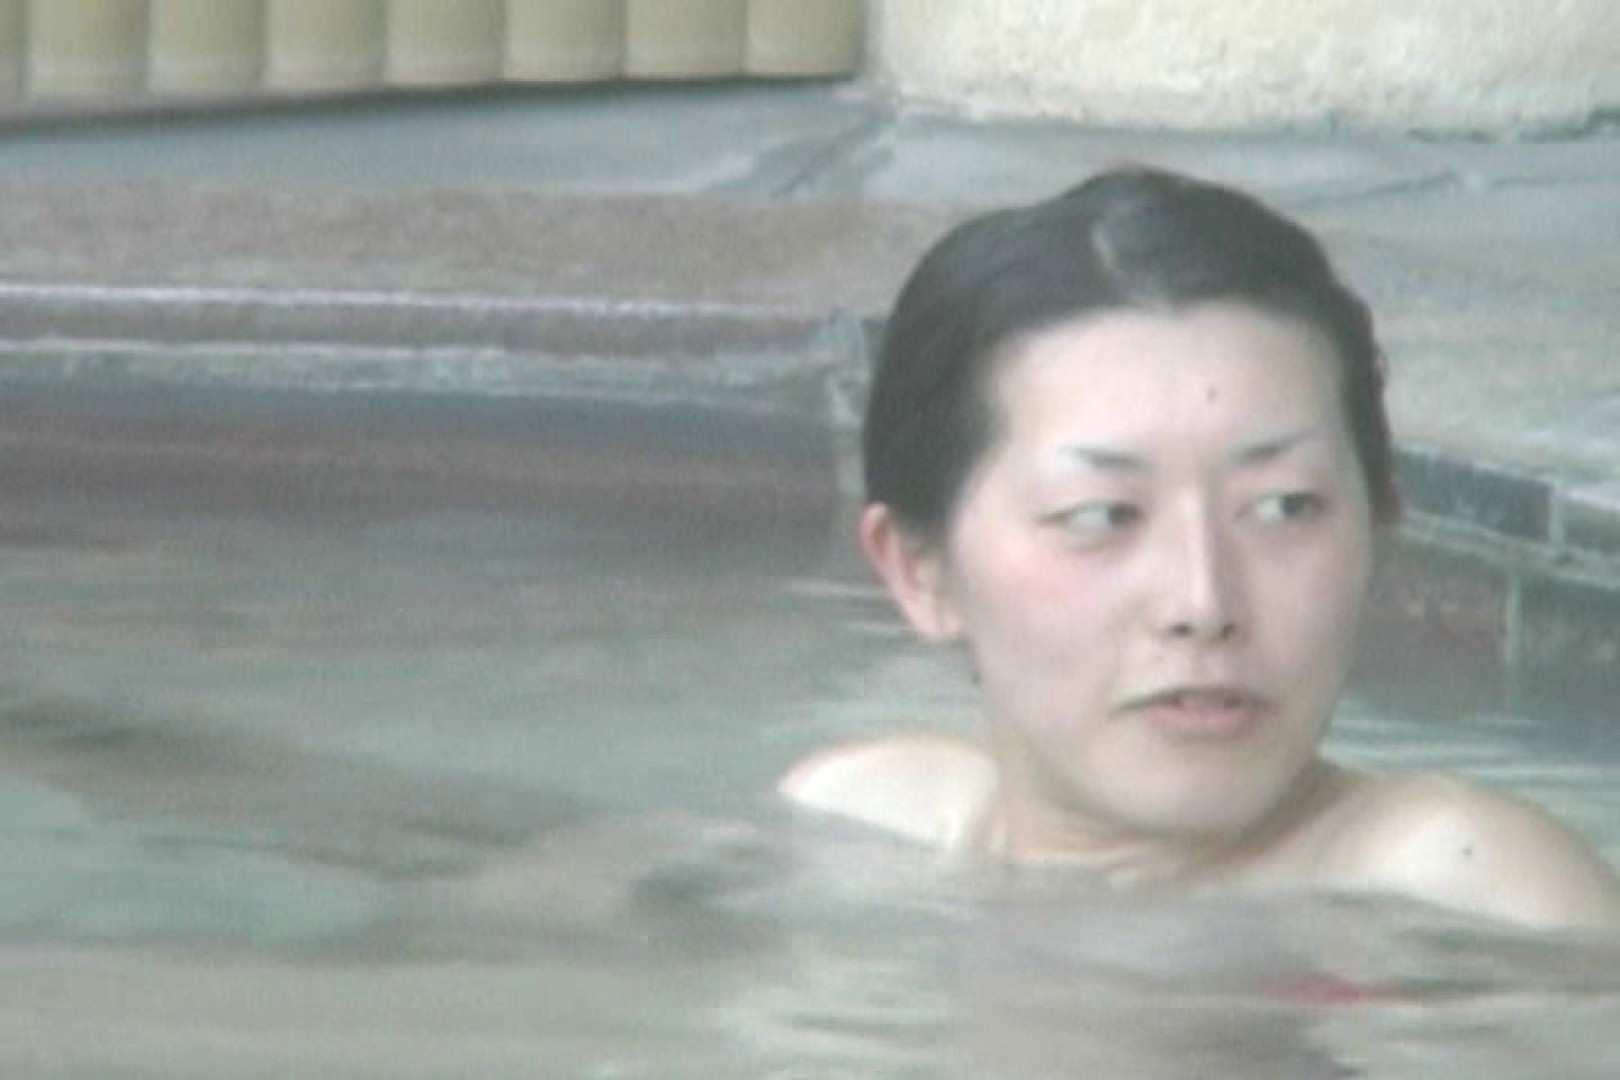 Aquaな露天風呂Vol.589 盗撮シリーズ | 露天風呂編  113PIX 17